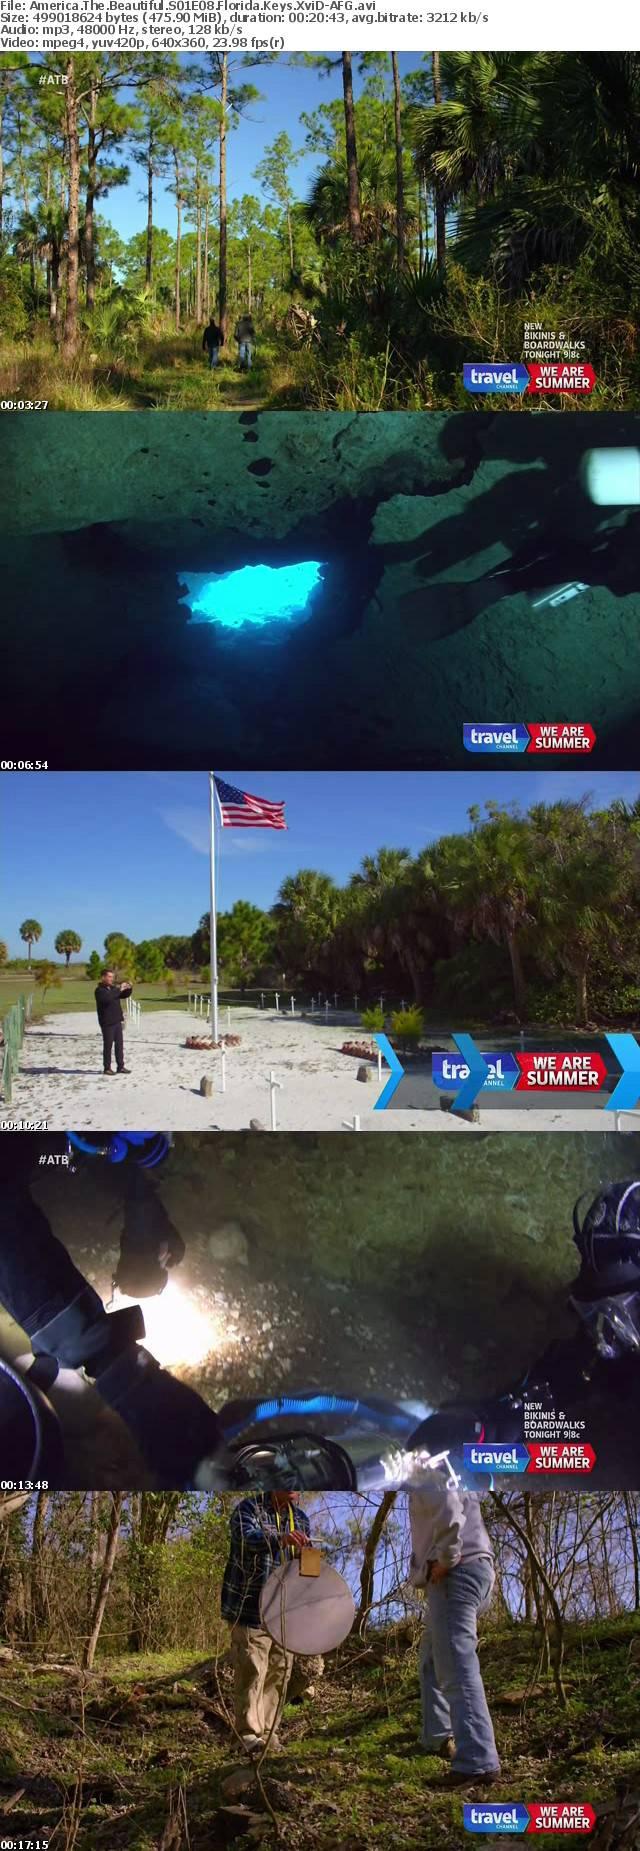 America The Beautiful S01E08 Florida Keys XviD-AFG